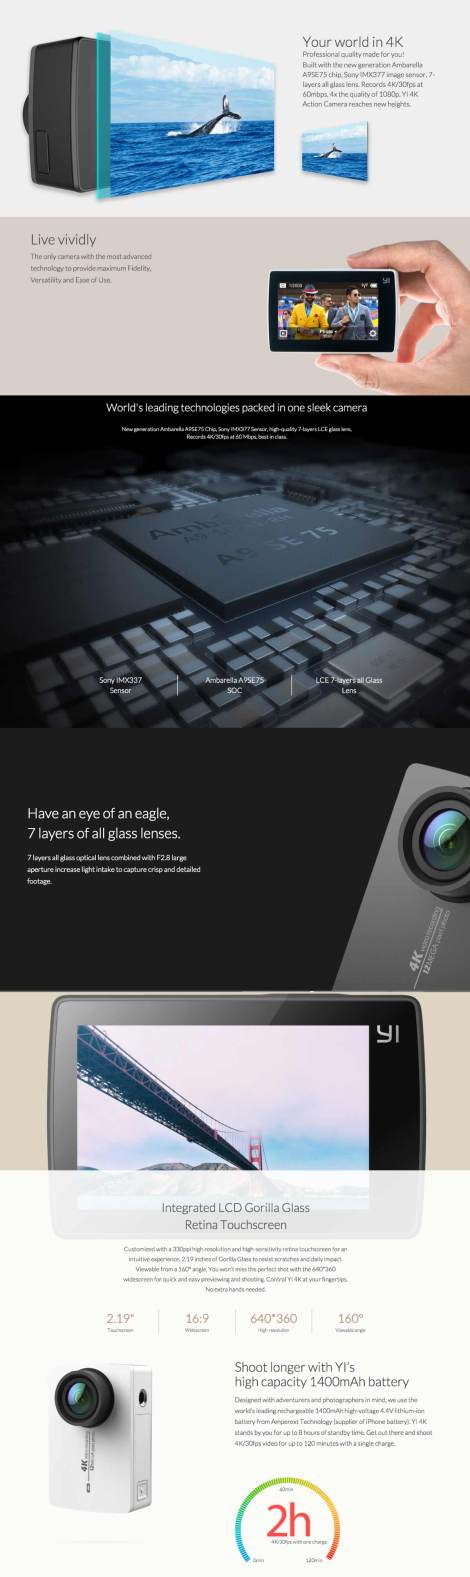 product-info-yi-4k (brosur)